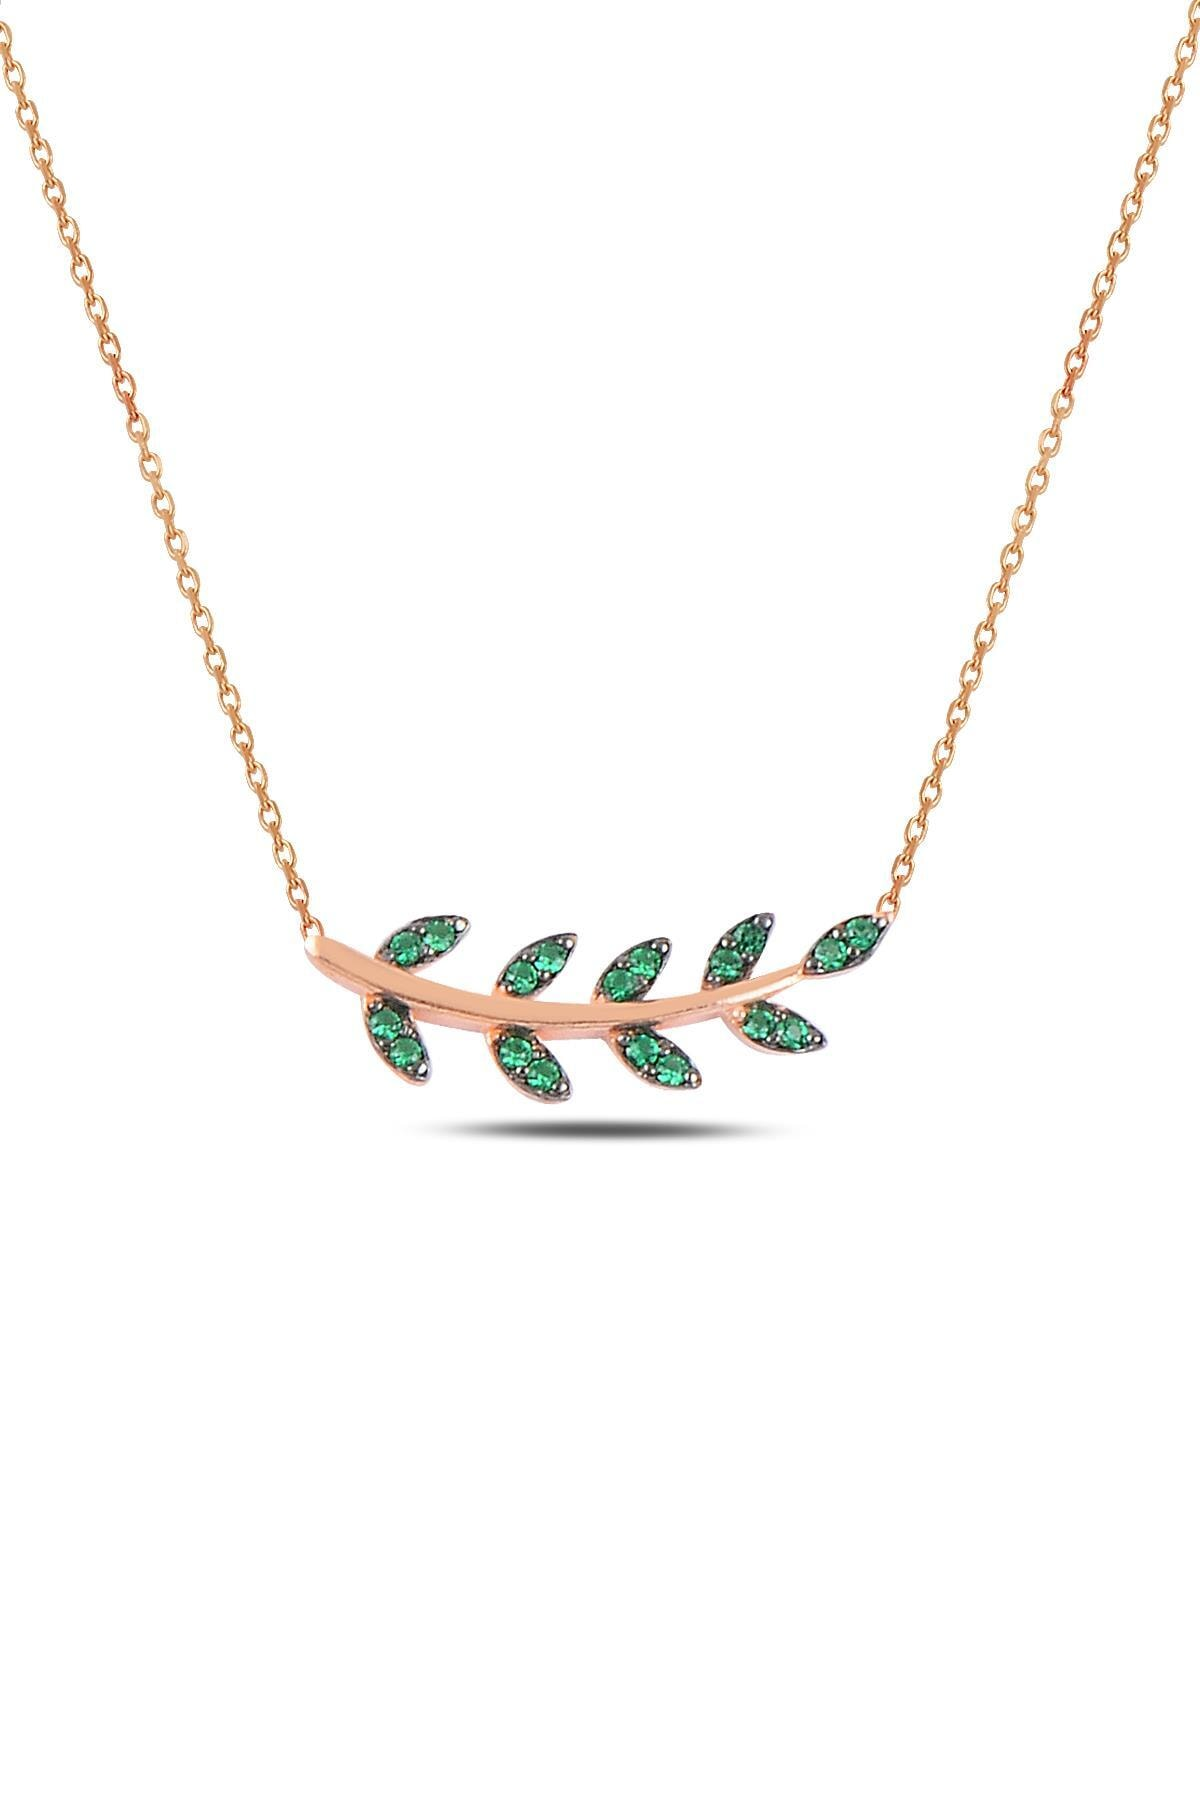 Söğütlü Silver Gümüş rose yeşil  taşlı yaprak  üçlü set 1